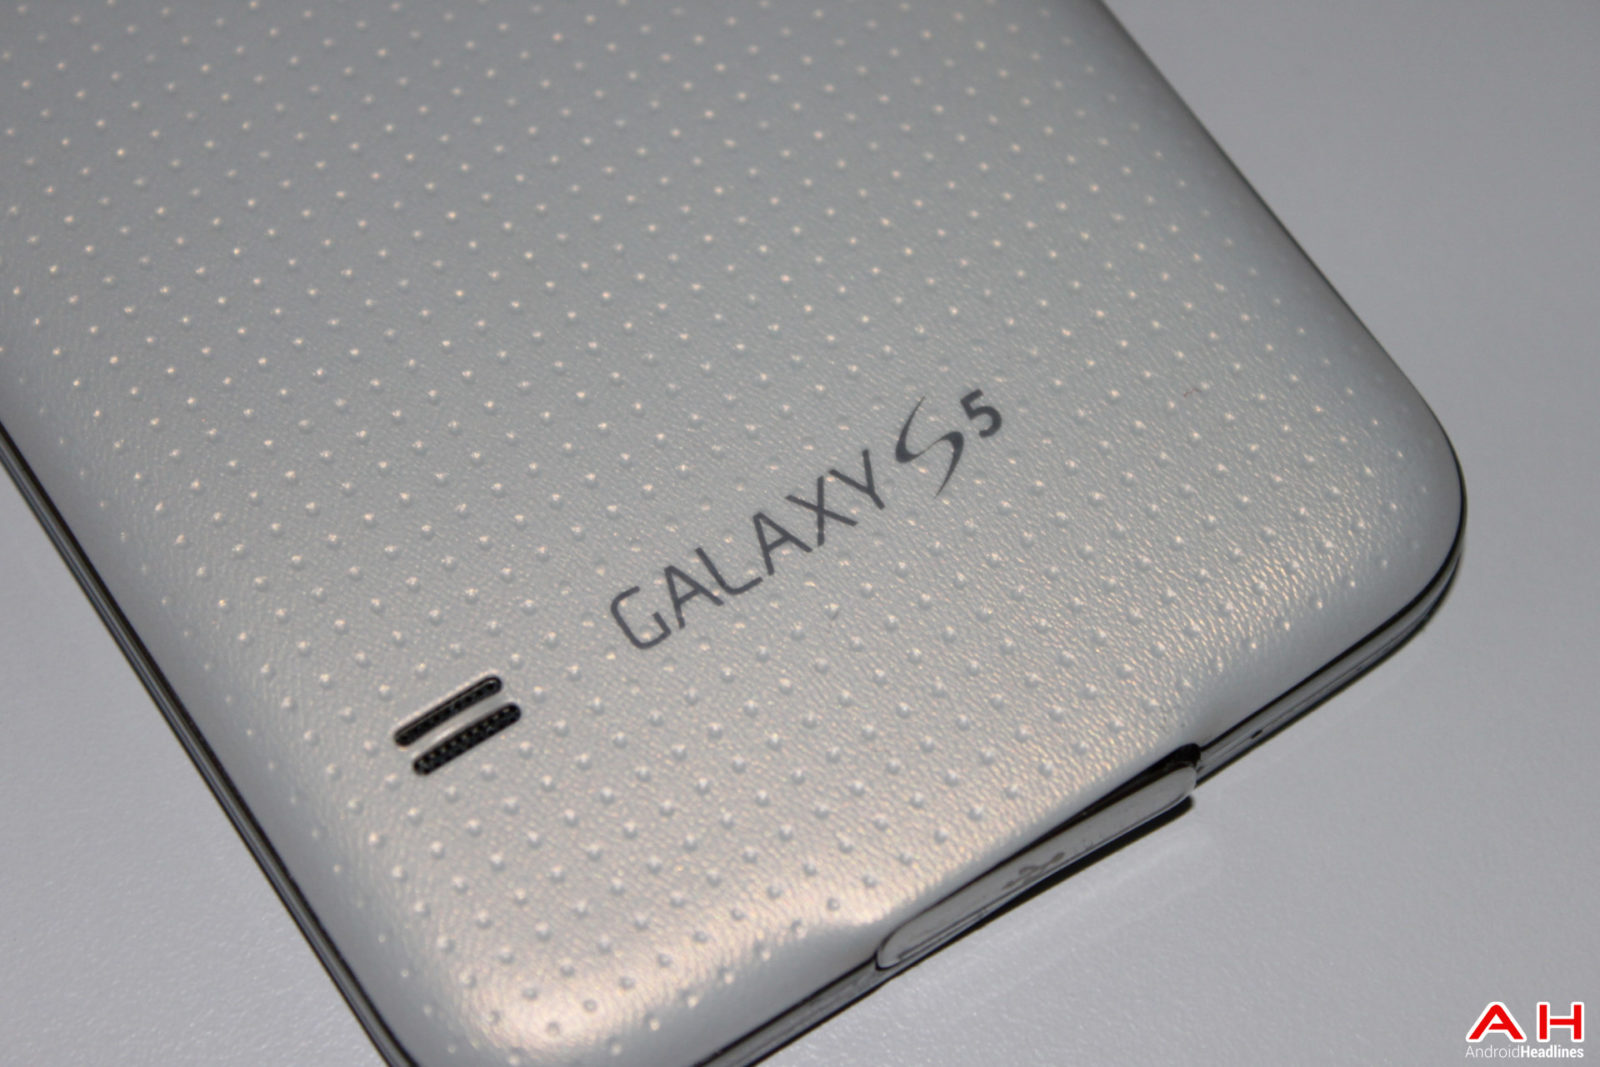 AH Samsung Galaxy S5 -15